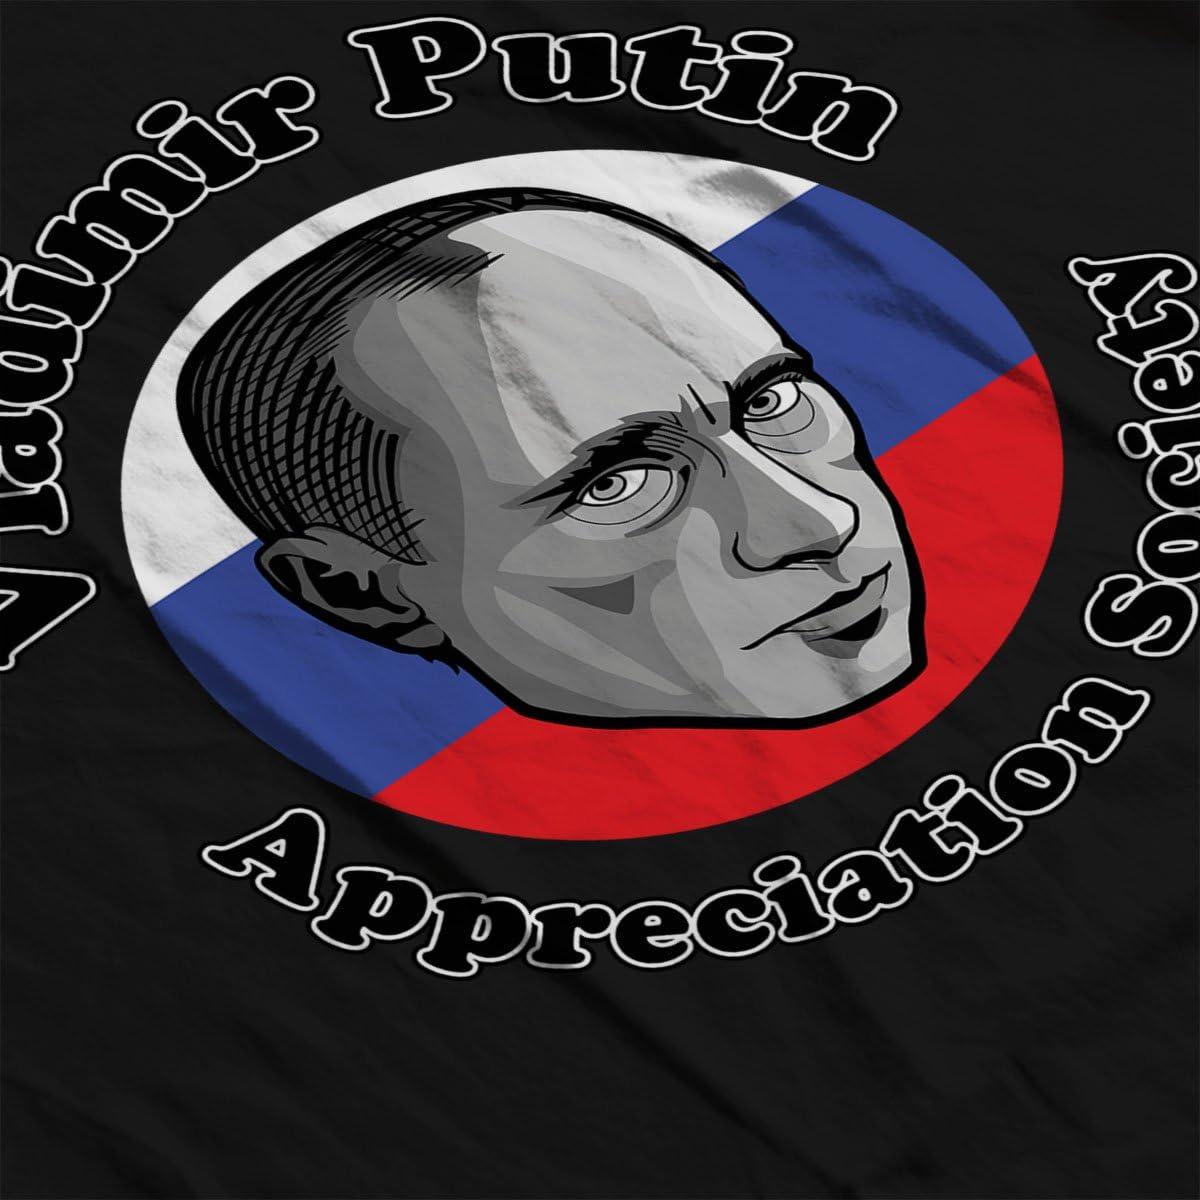 Coto7 Vladimir Putin Appreciation Society Kids Sweatshirt